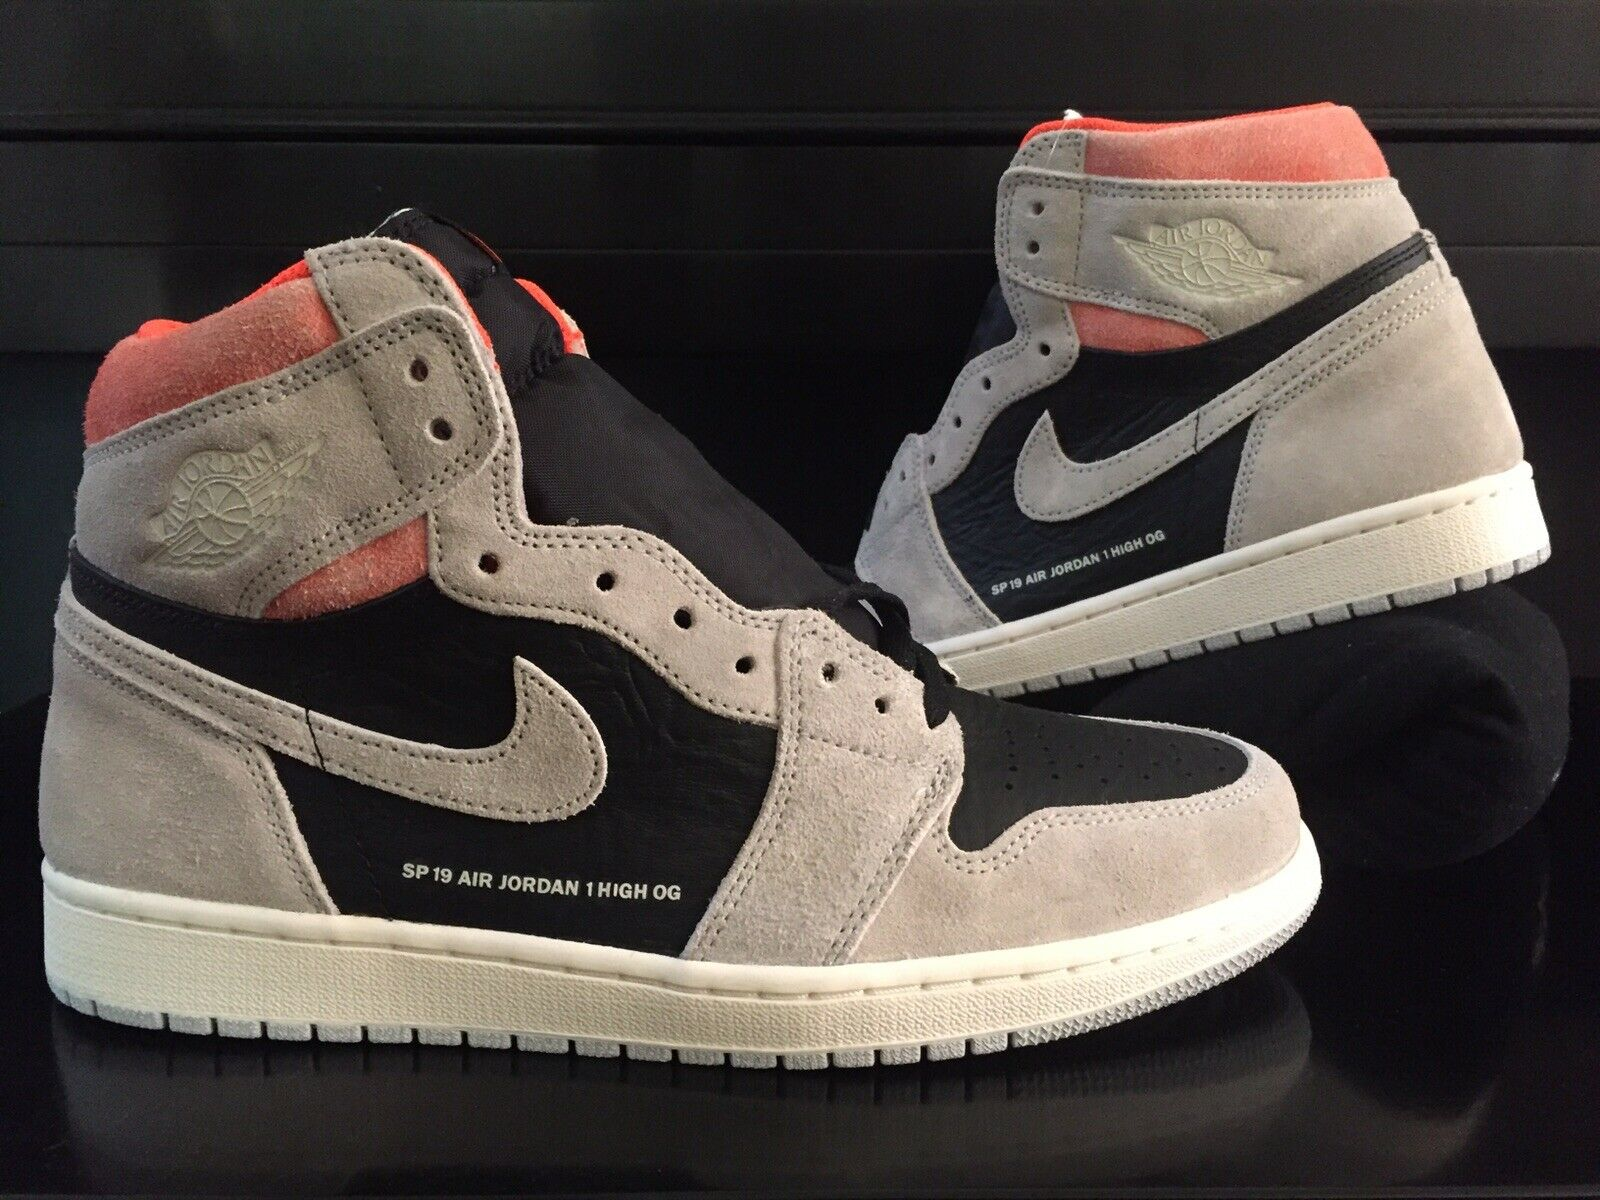 0008966540fb AIR RETRO 1 HIGH OG NEUTRAL GREY BLACK SP 19 QS HYPER CRIMSON 10.5 NIKE  JORDAN nneawl7559-Athletic Shoes